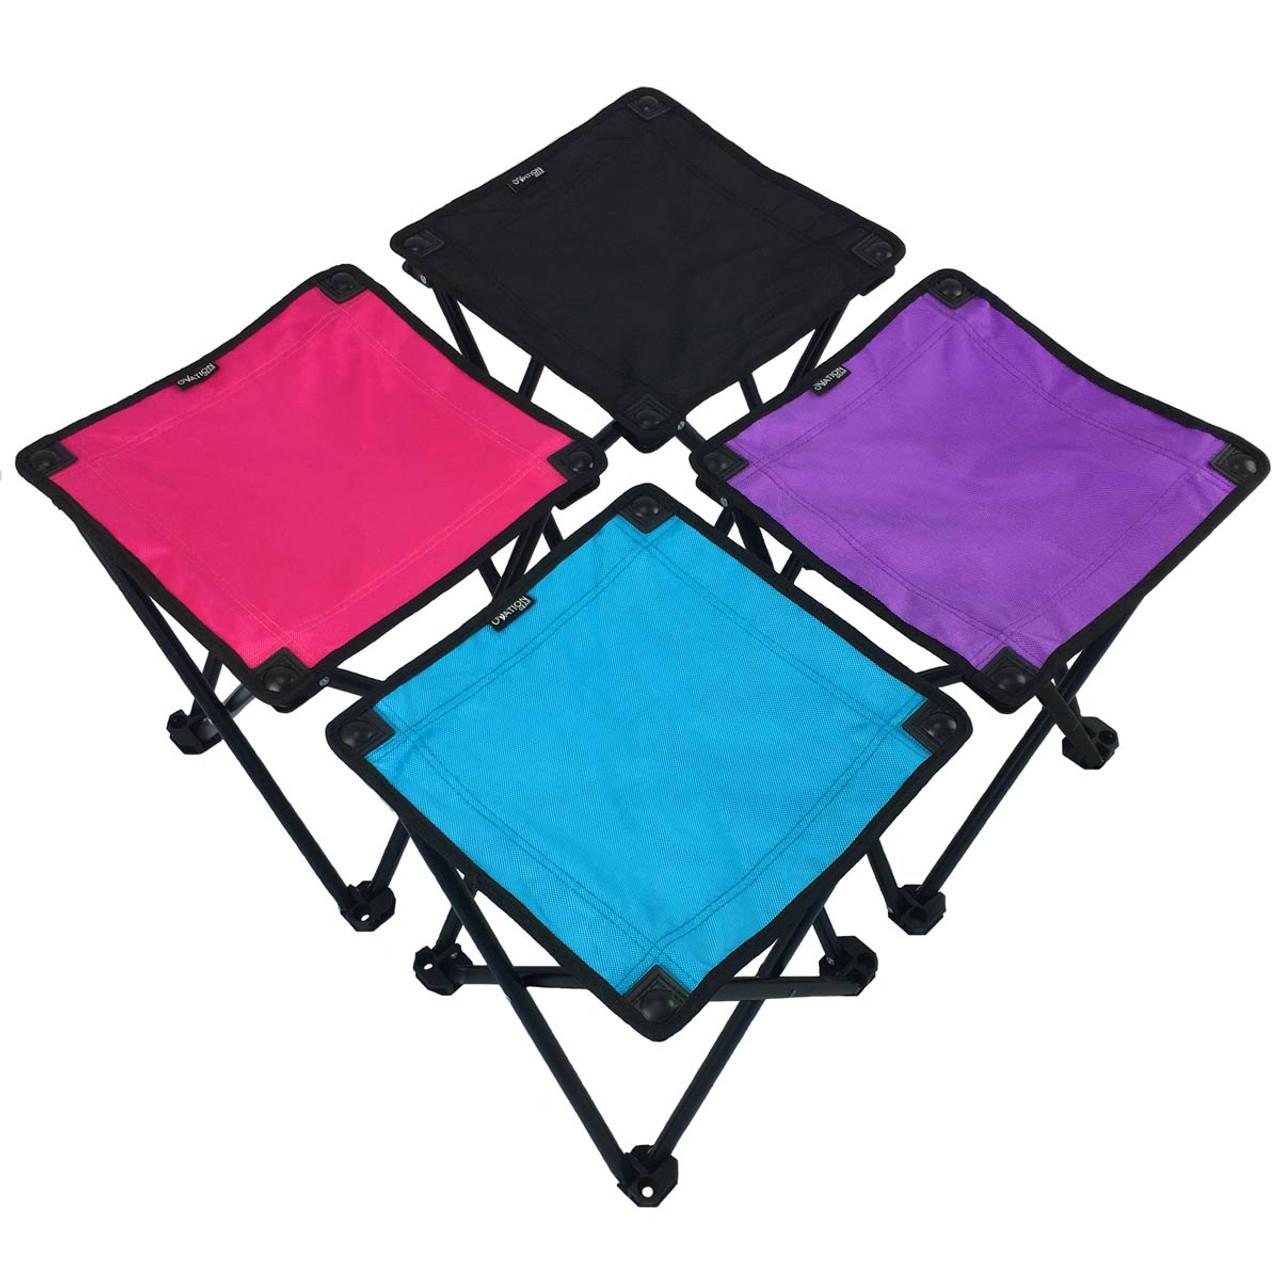 Tremendous Folding Stool Pabps2019 Chair Design Images Pabps2019Com